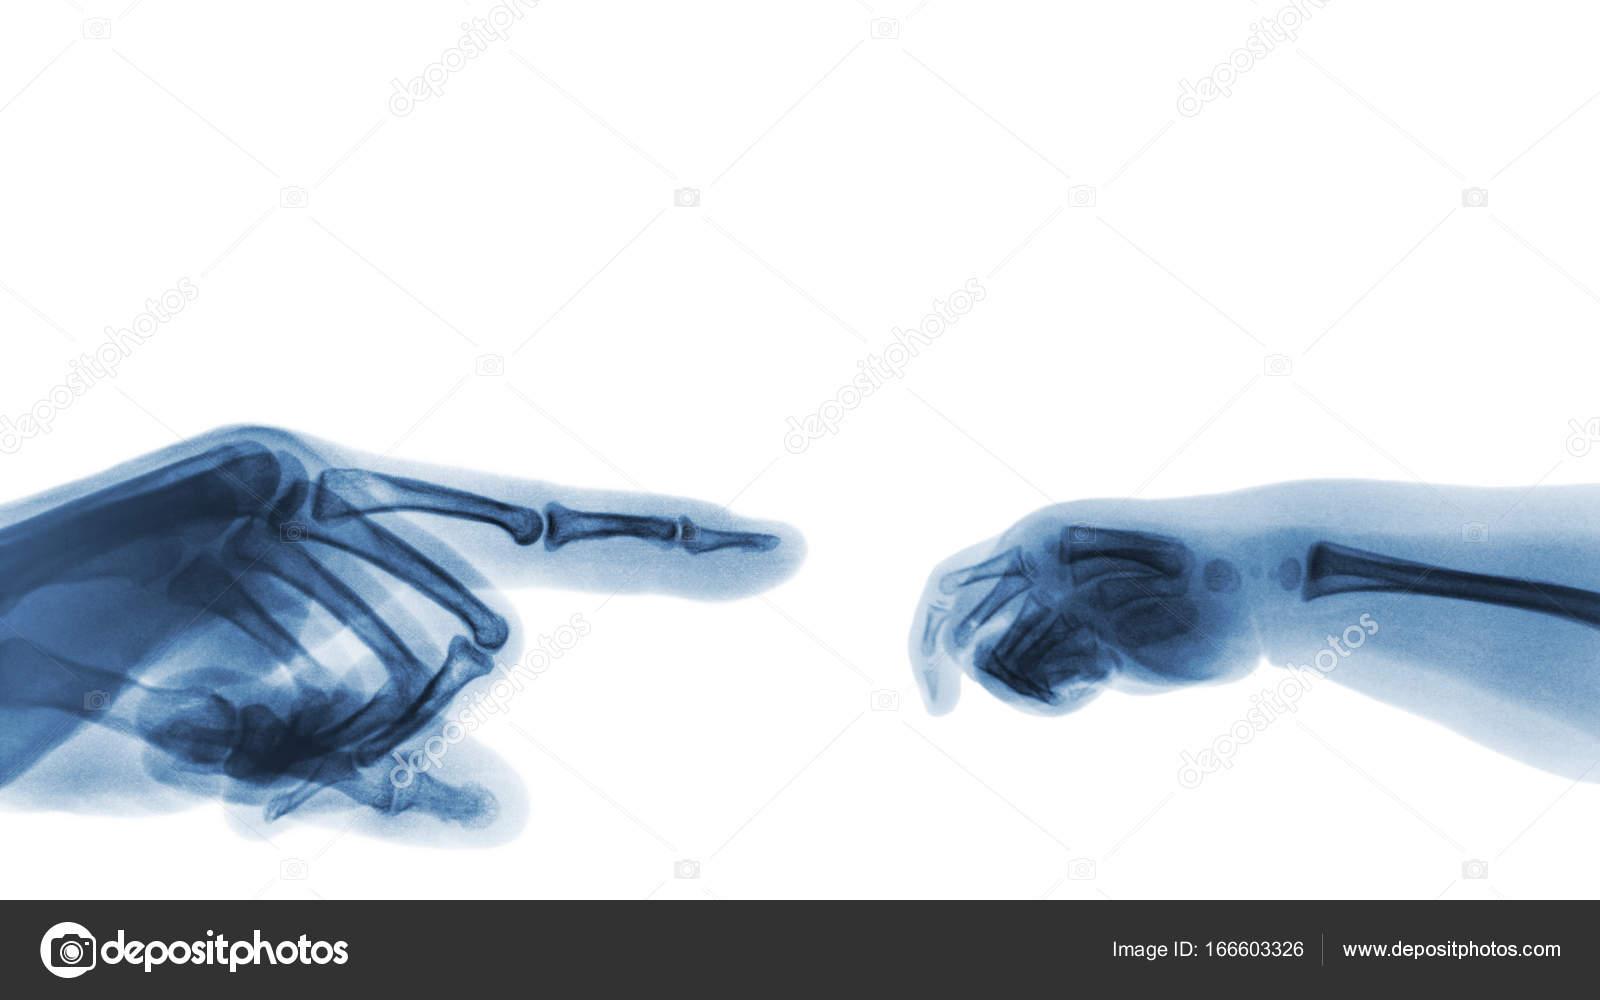 72dcf4123cb4 Ακτινογραφία του ενήλικα σημείο χέρι δάχτυλο στην αριστερή πλευρά και το  χέρι του μωρού στην δεξιά πλευρά. Κενή περιοχή στο επάνω πλευρά– εικόνα  αρχείου